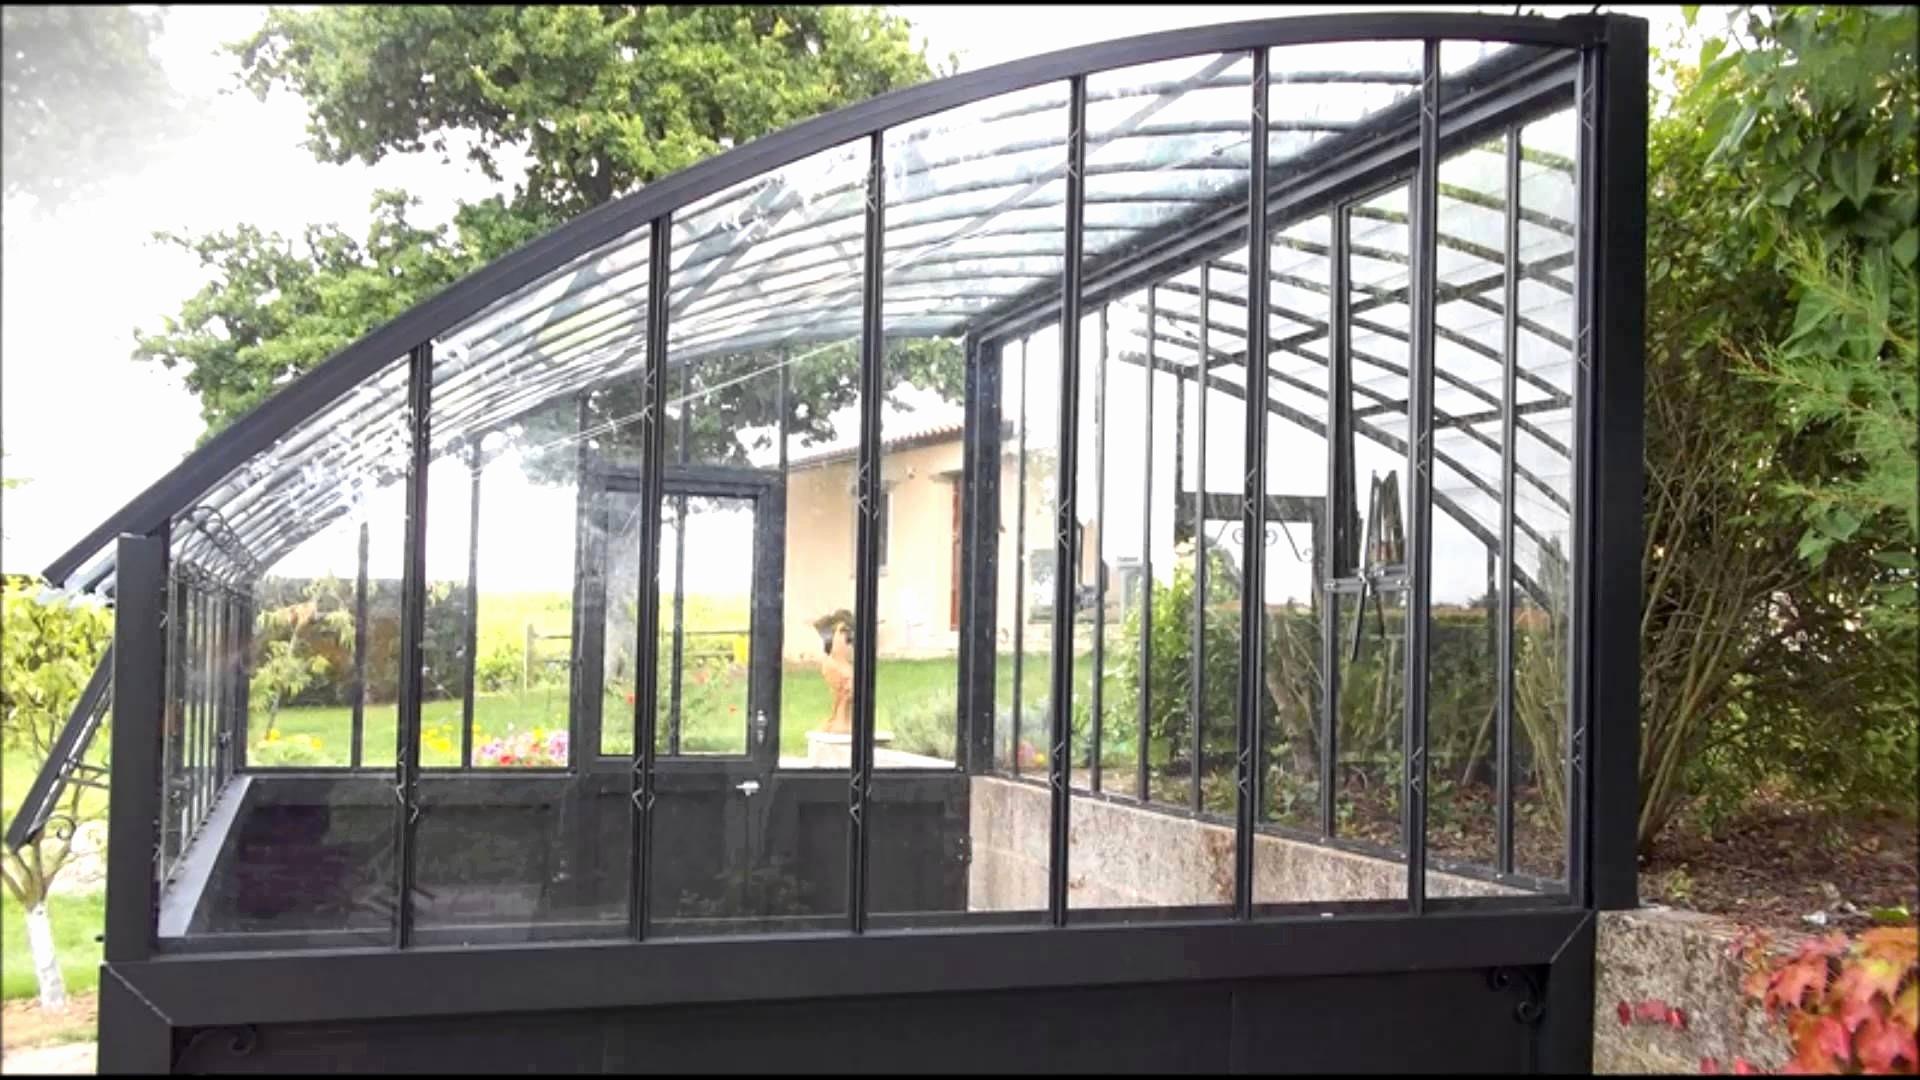 Bassin Jardin Moderne Beau Stock Abonnement Maison Et Jardin Inspirant S S Media Cache Ak0 Pinimg